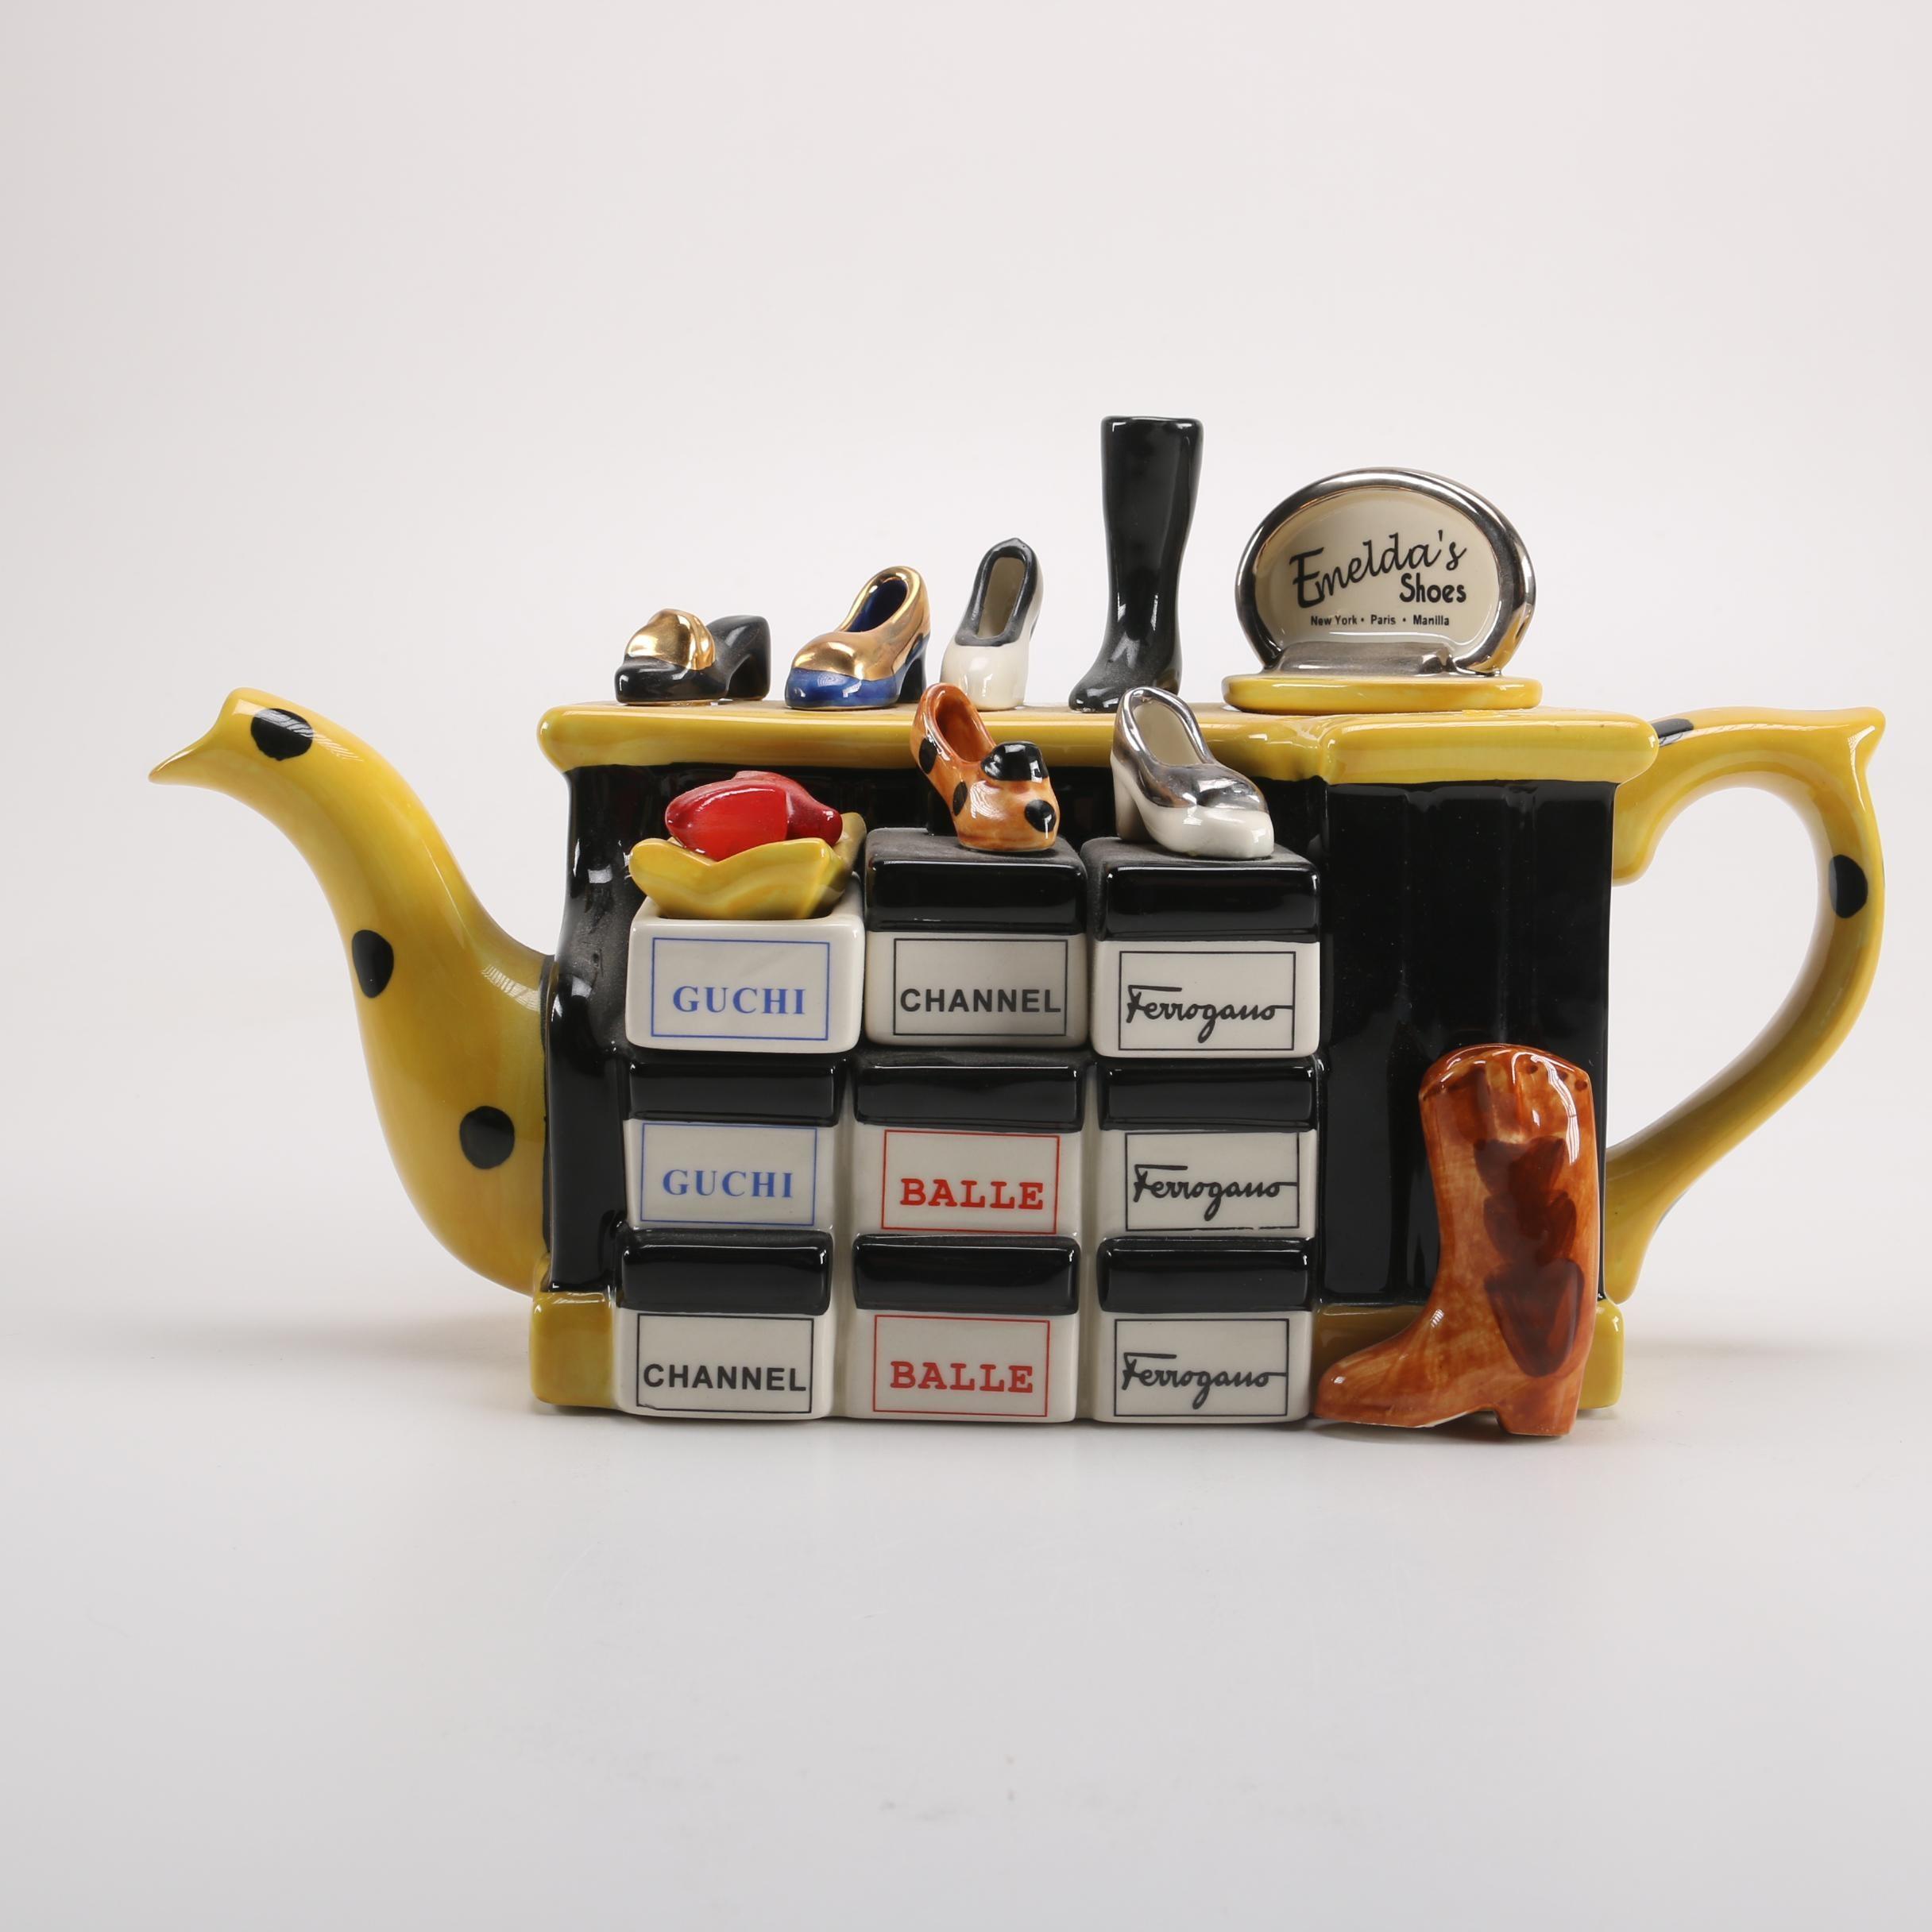 Tony Carter Shoe Teapot